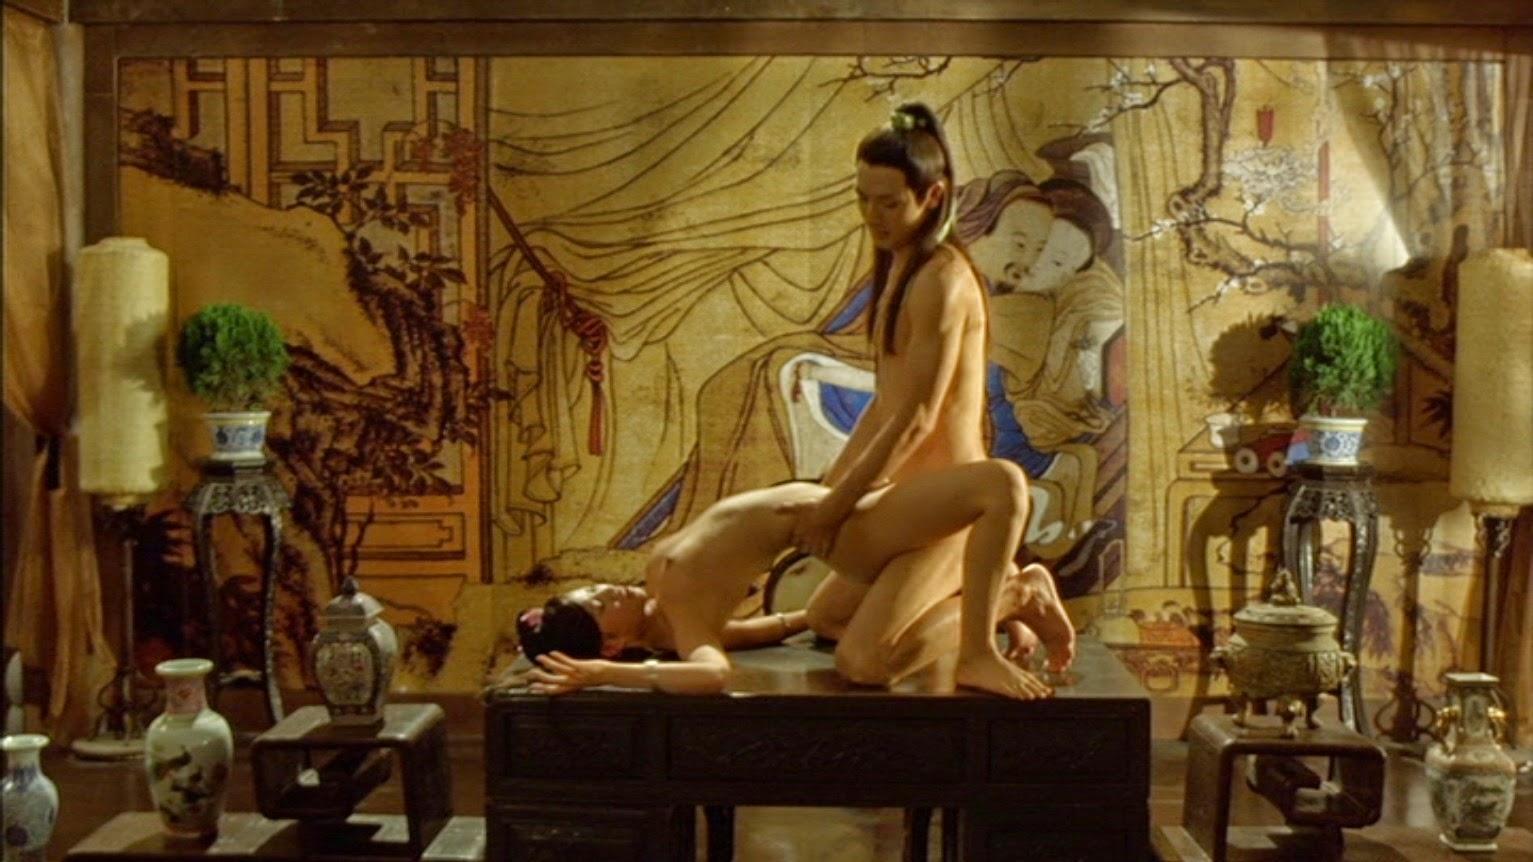 The forbidden legend sex and chopsticks stream